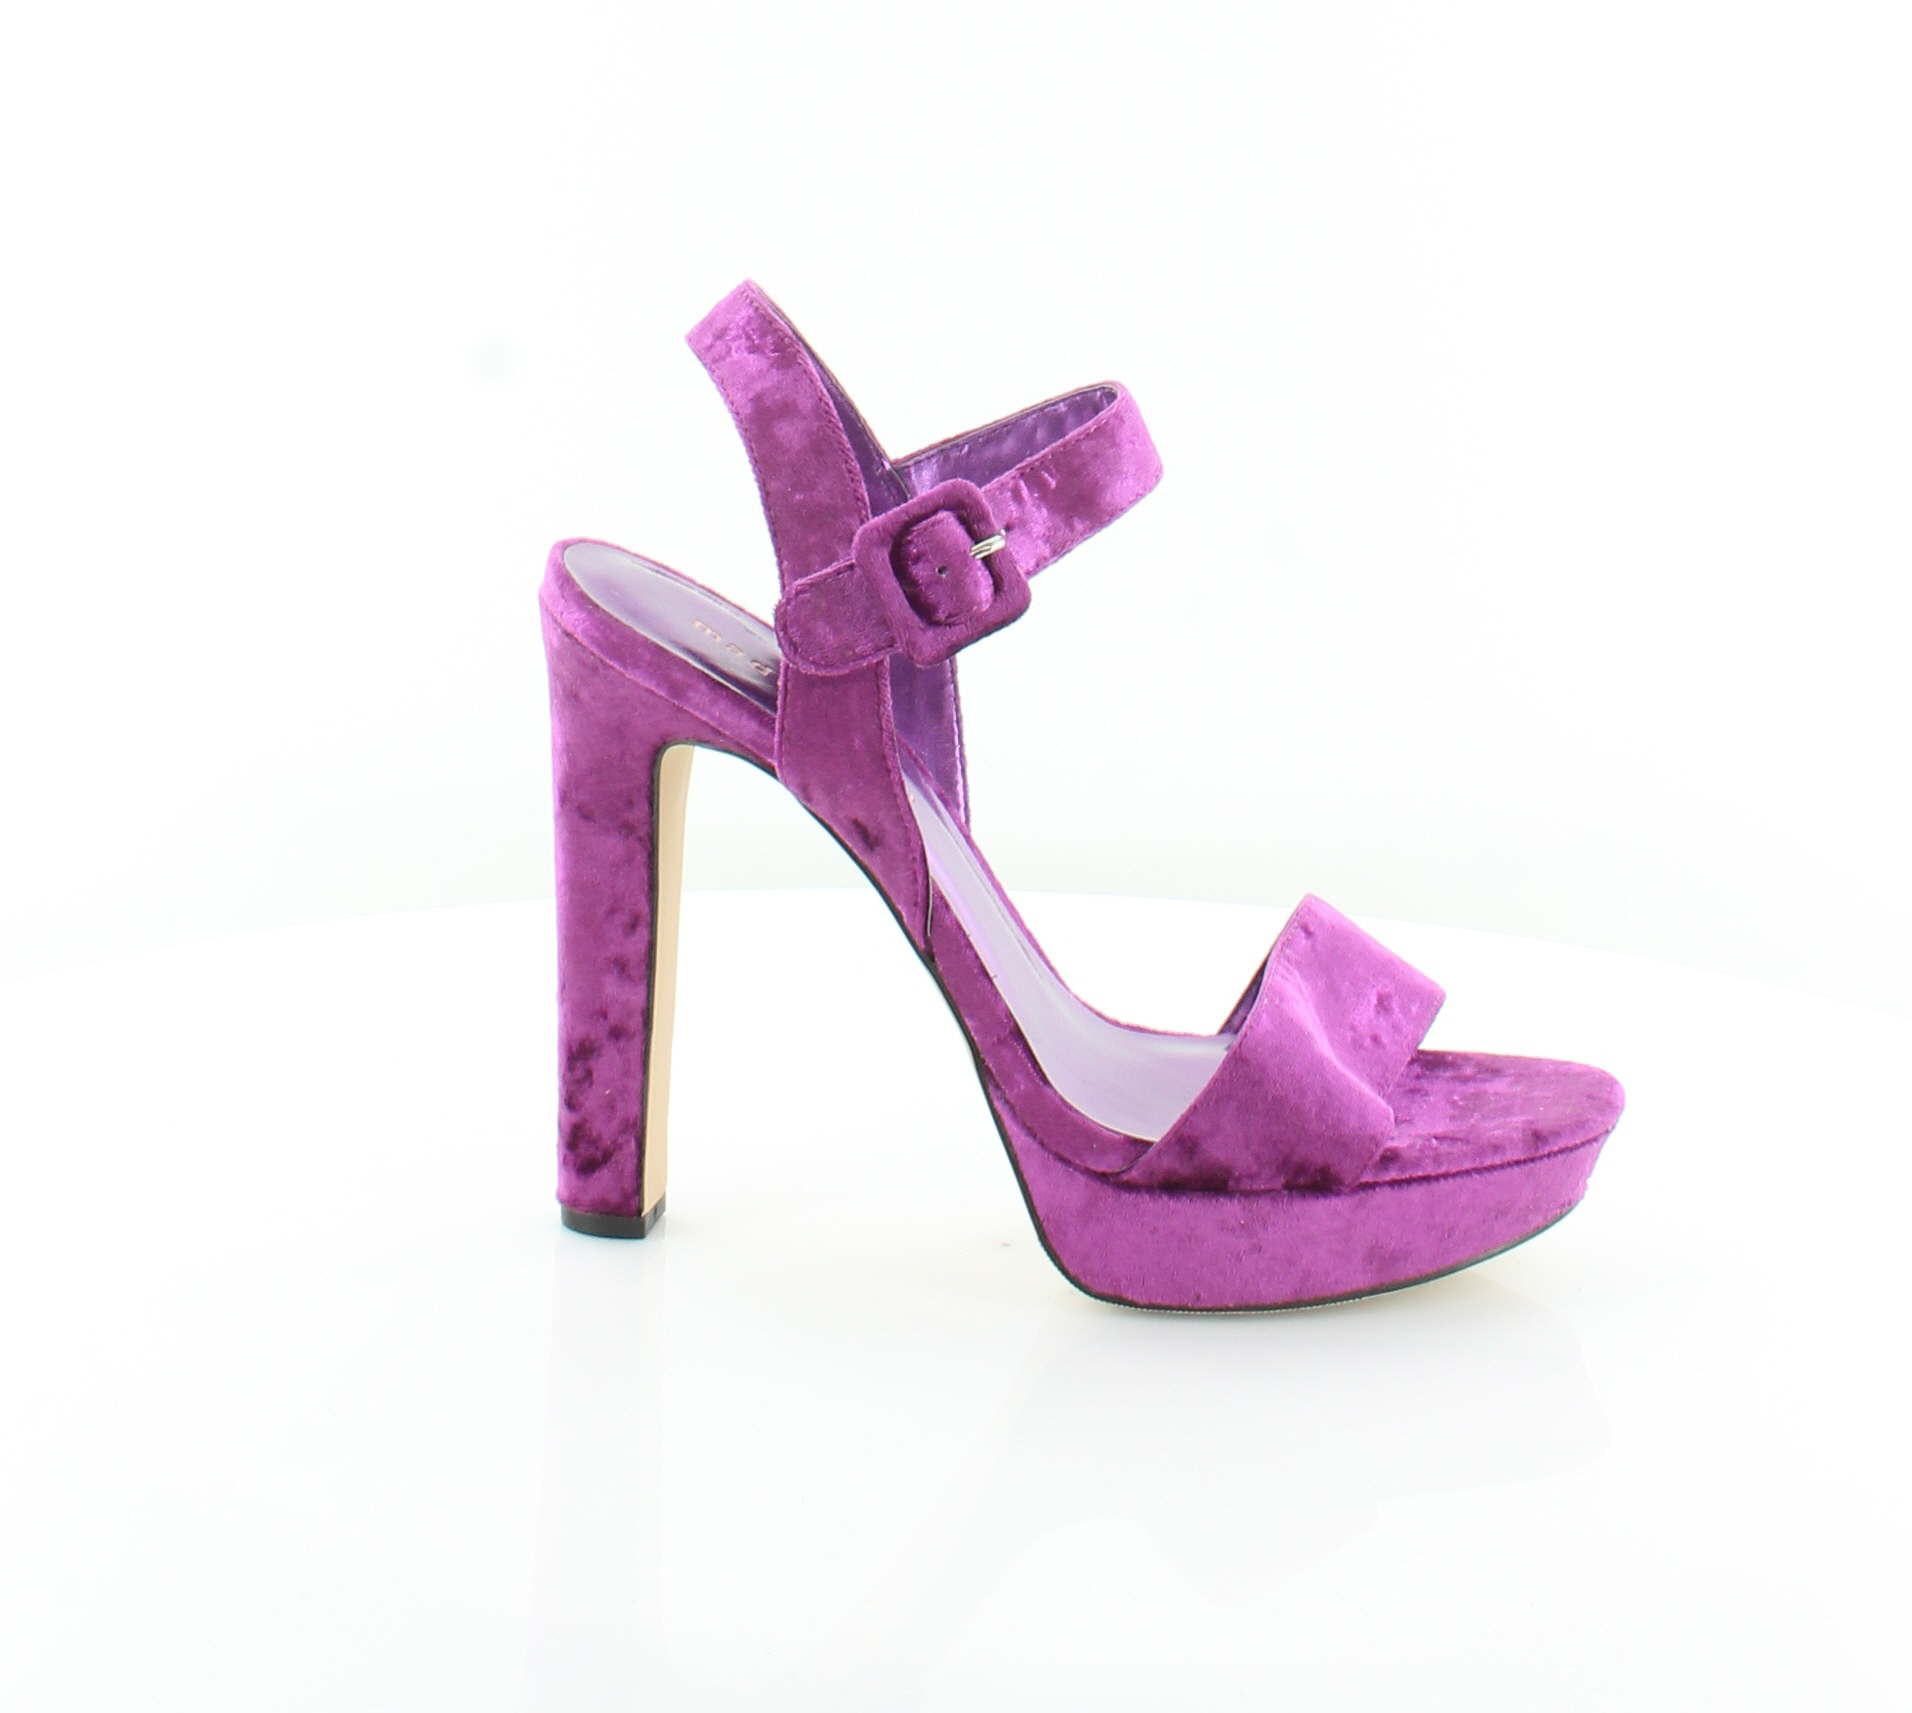 Madden Girl Rolloo Women's Heels Fuchsia